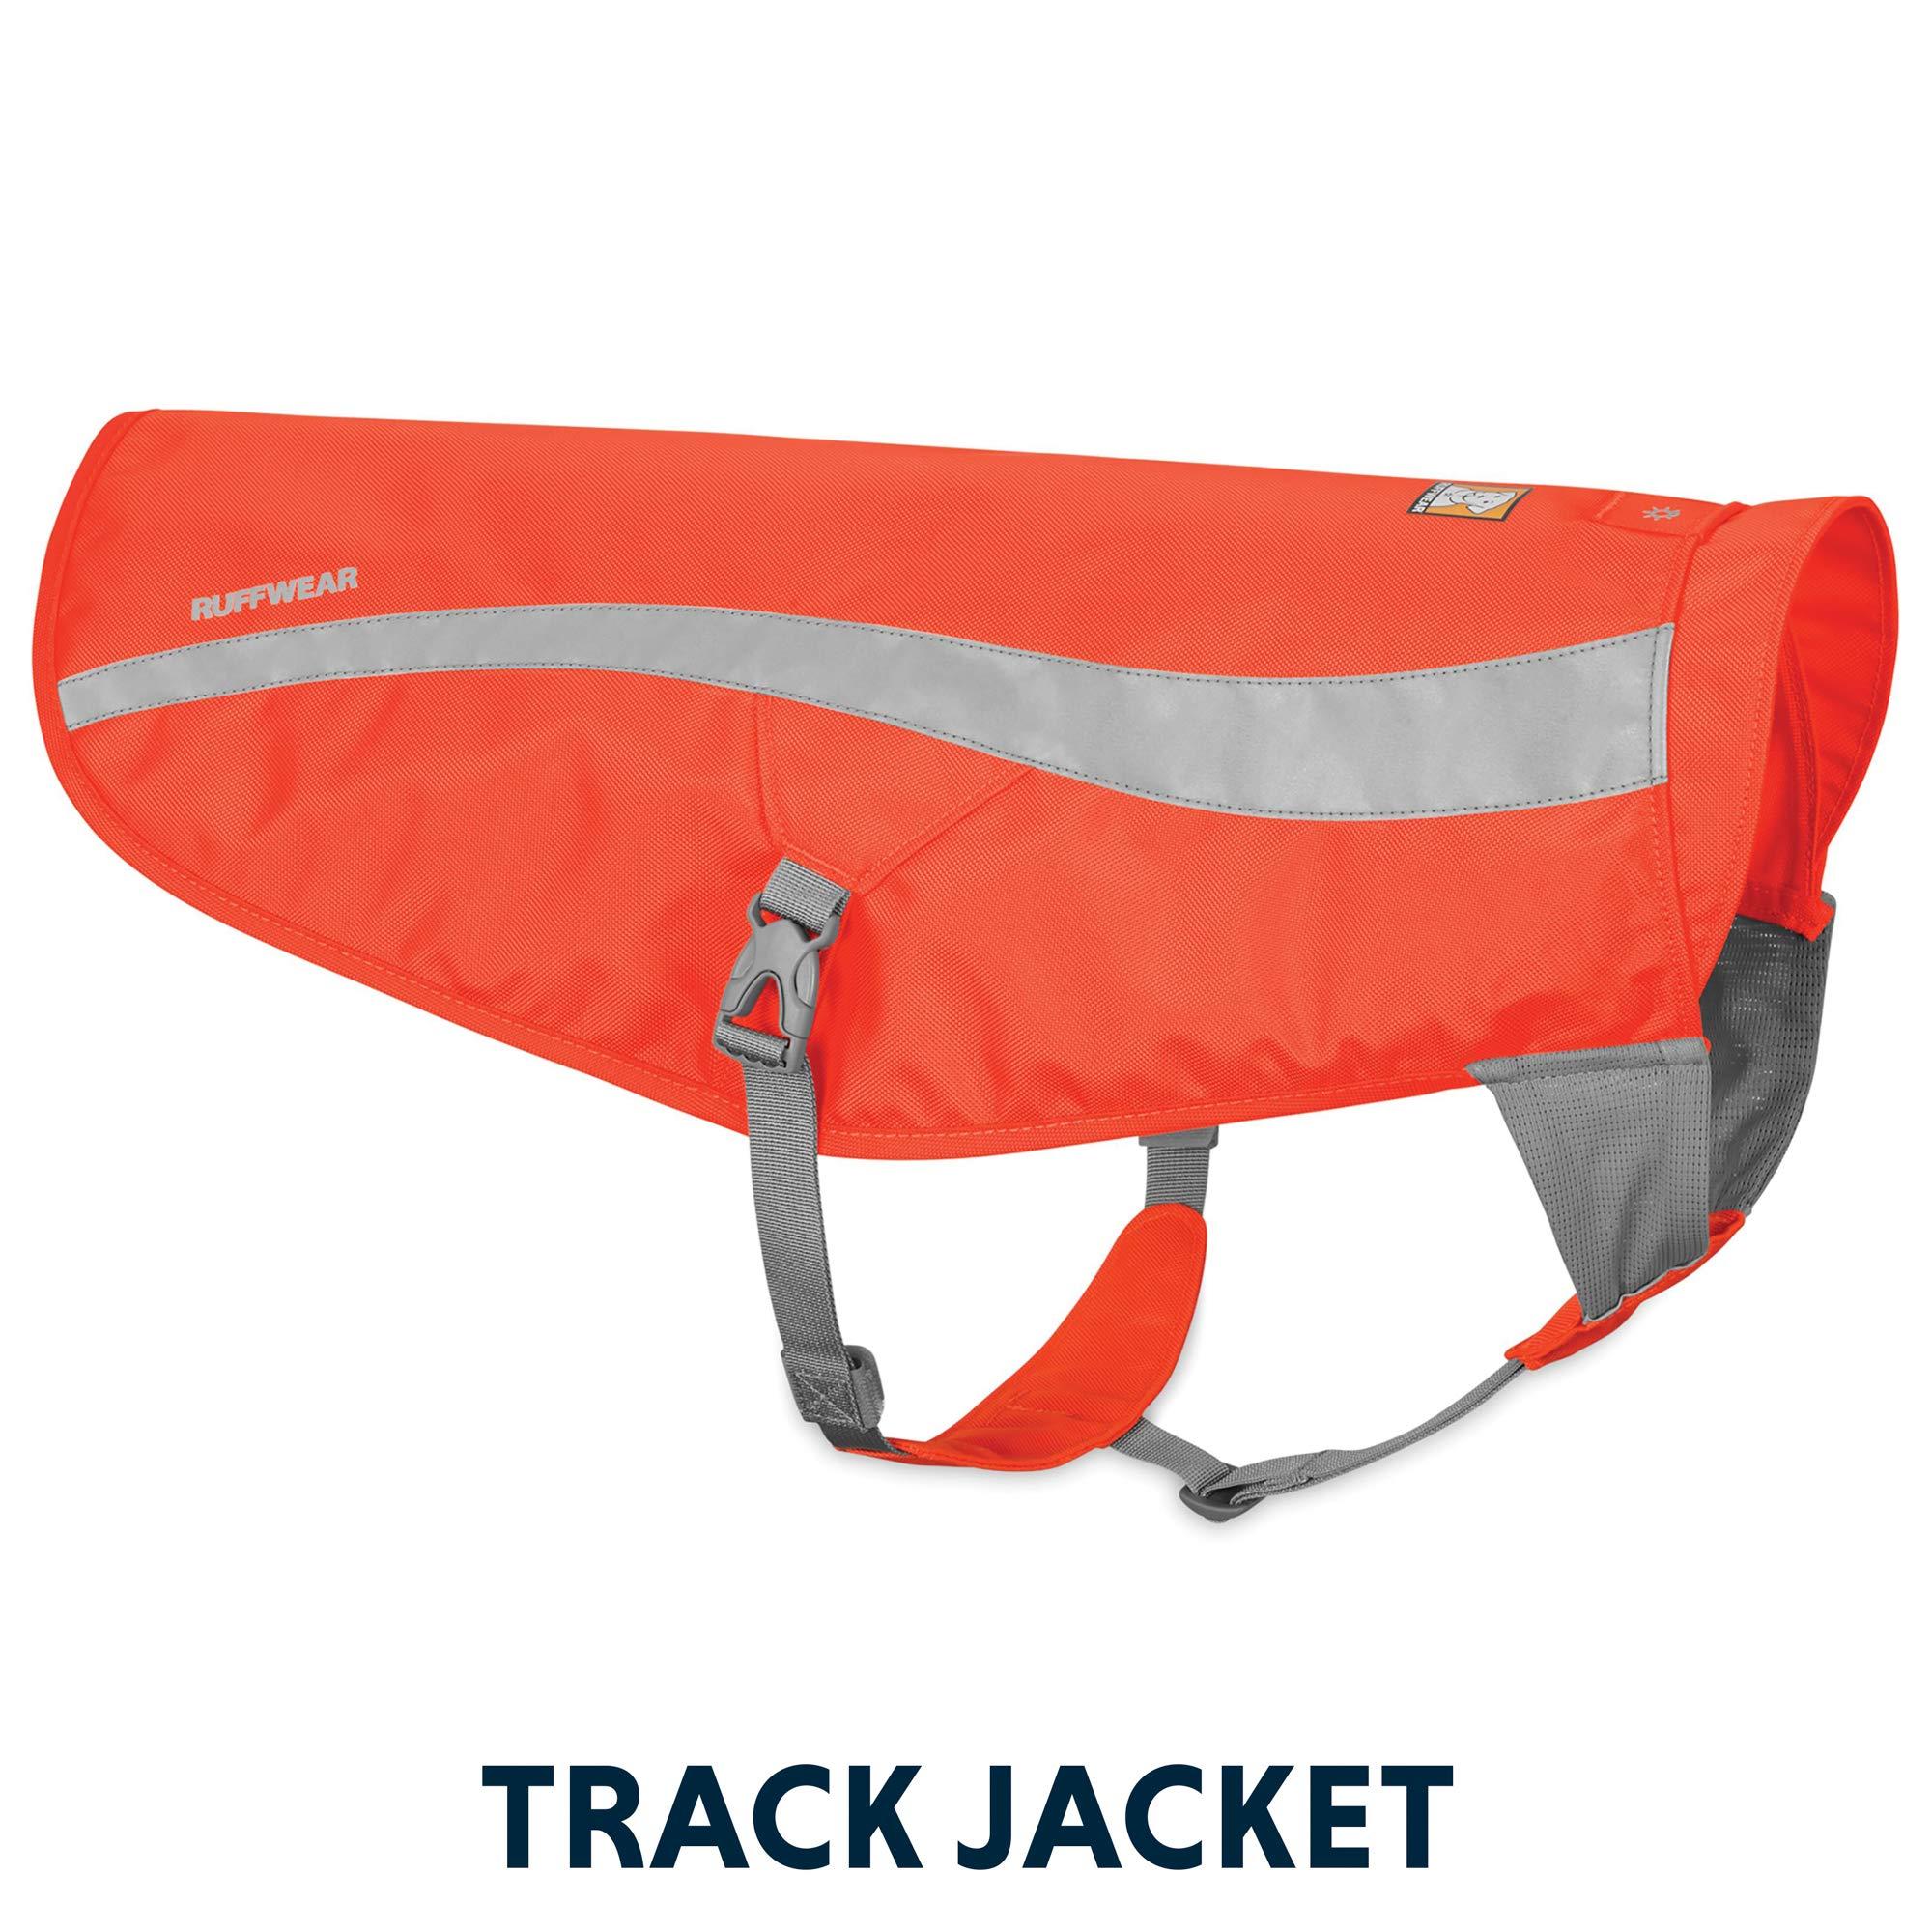 RUFFWEAR - Track Jacket High Visibility Reflective Safety Jacket for Dogs, Blaze Orange, Large/X-Large (2018) by RUFFWEAR